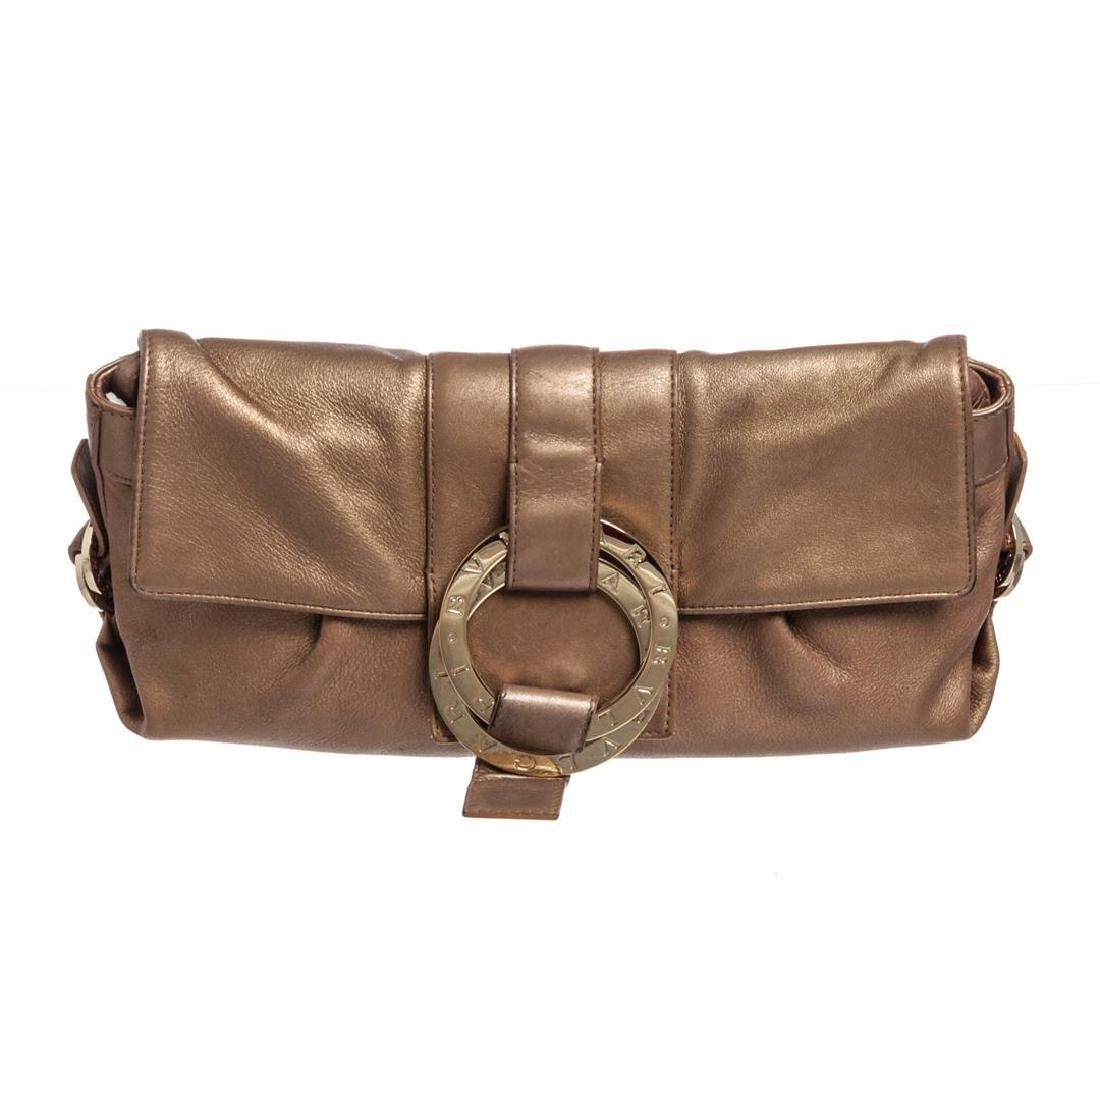 Bvlgari Metallic Bronze Leather Flap Convertible Clutch